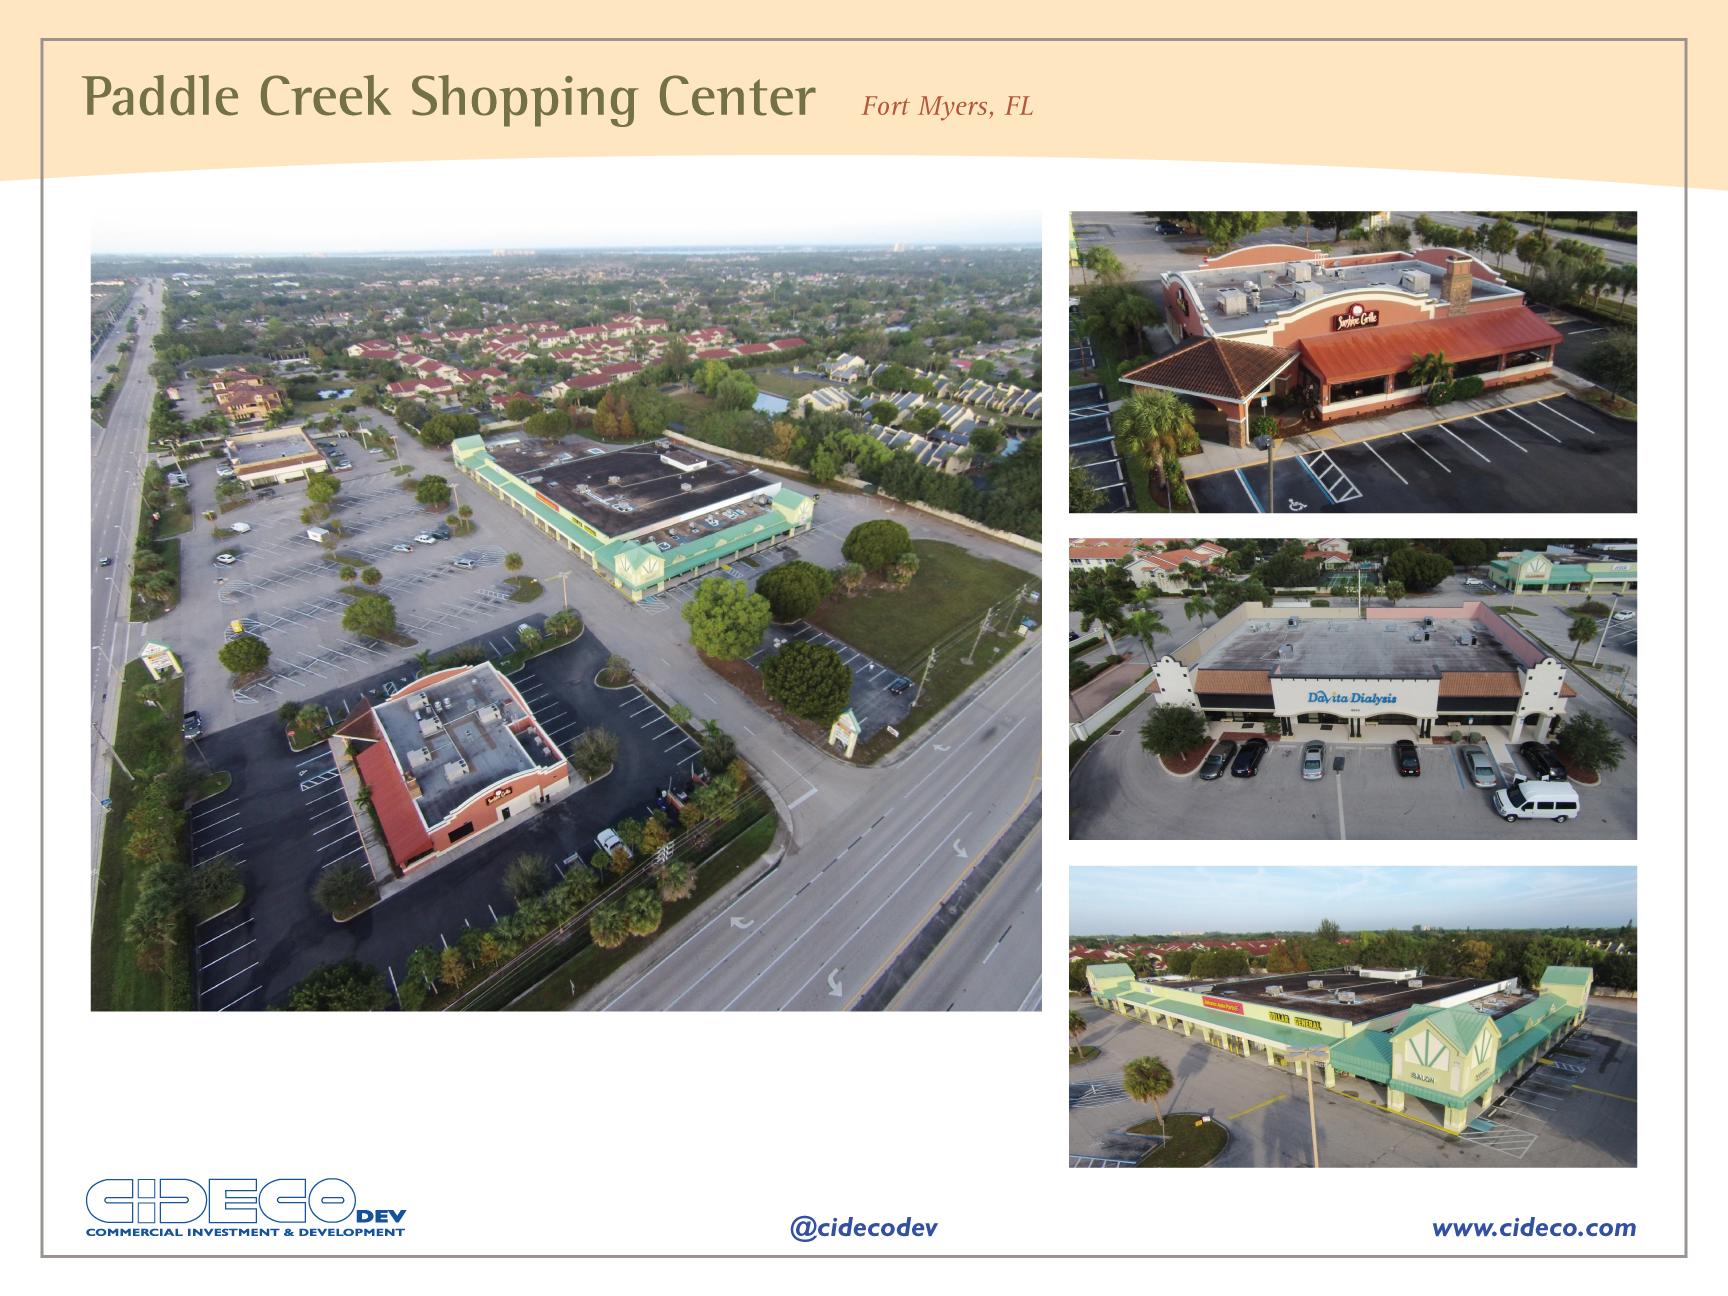 Paddle-Creek-Shop-Center-Poster-2015